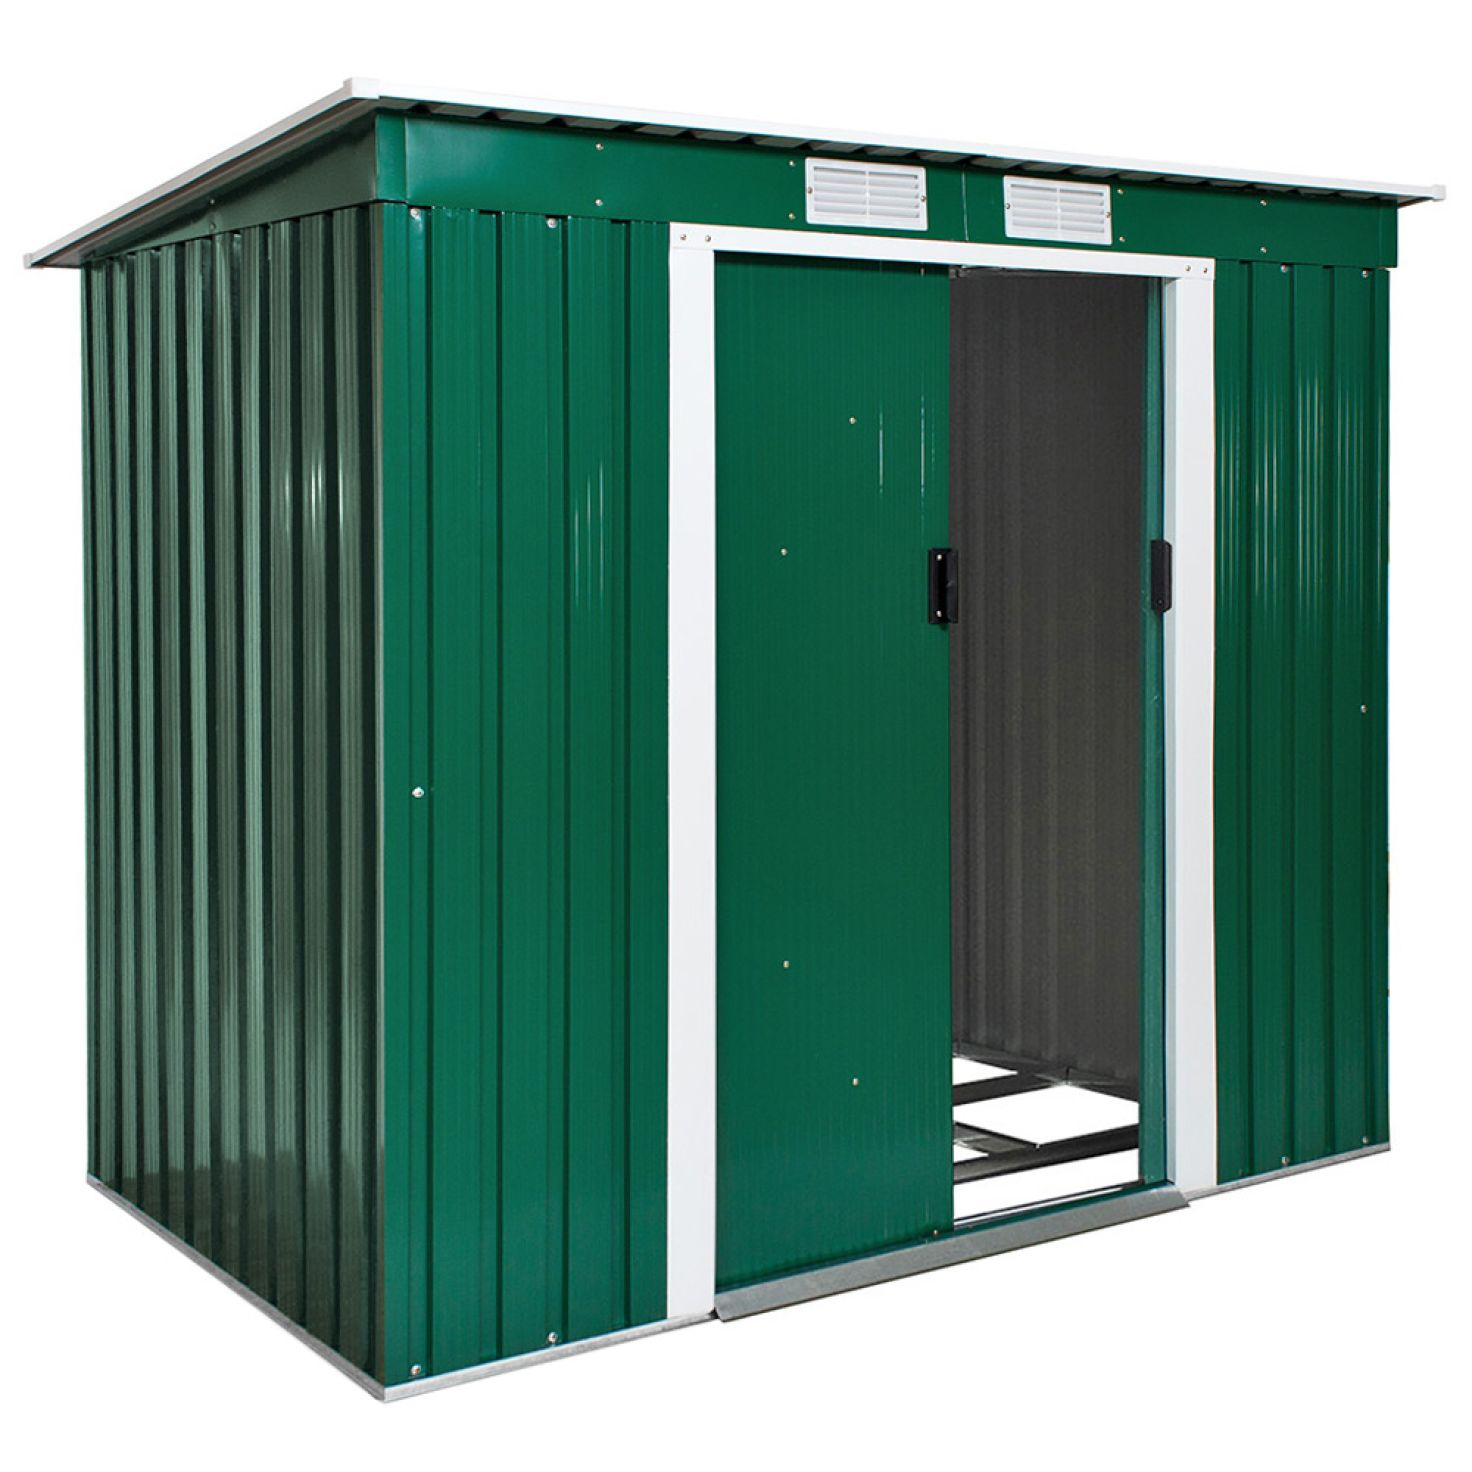 Abri De Jardin Métal 2,7 M² Toiture Monopente Vert avec Abri Jardin Metal Pas Cher